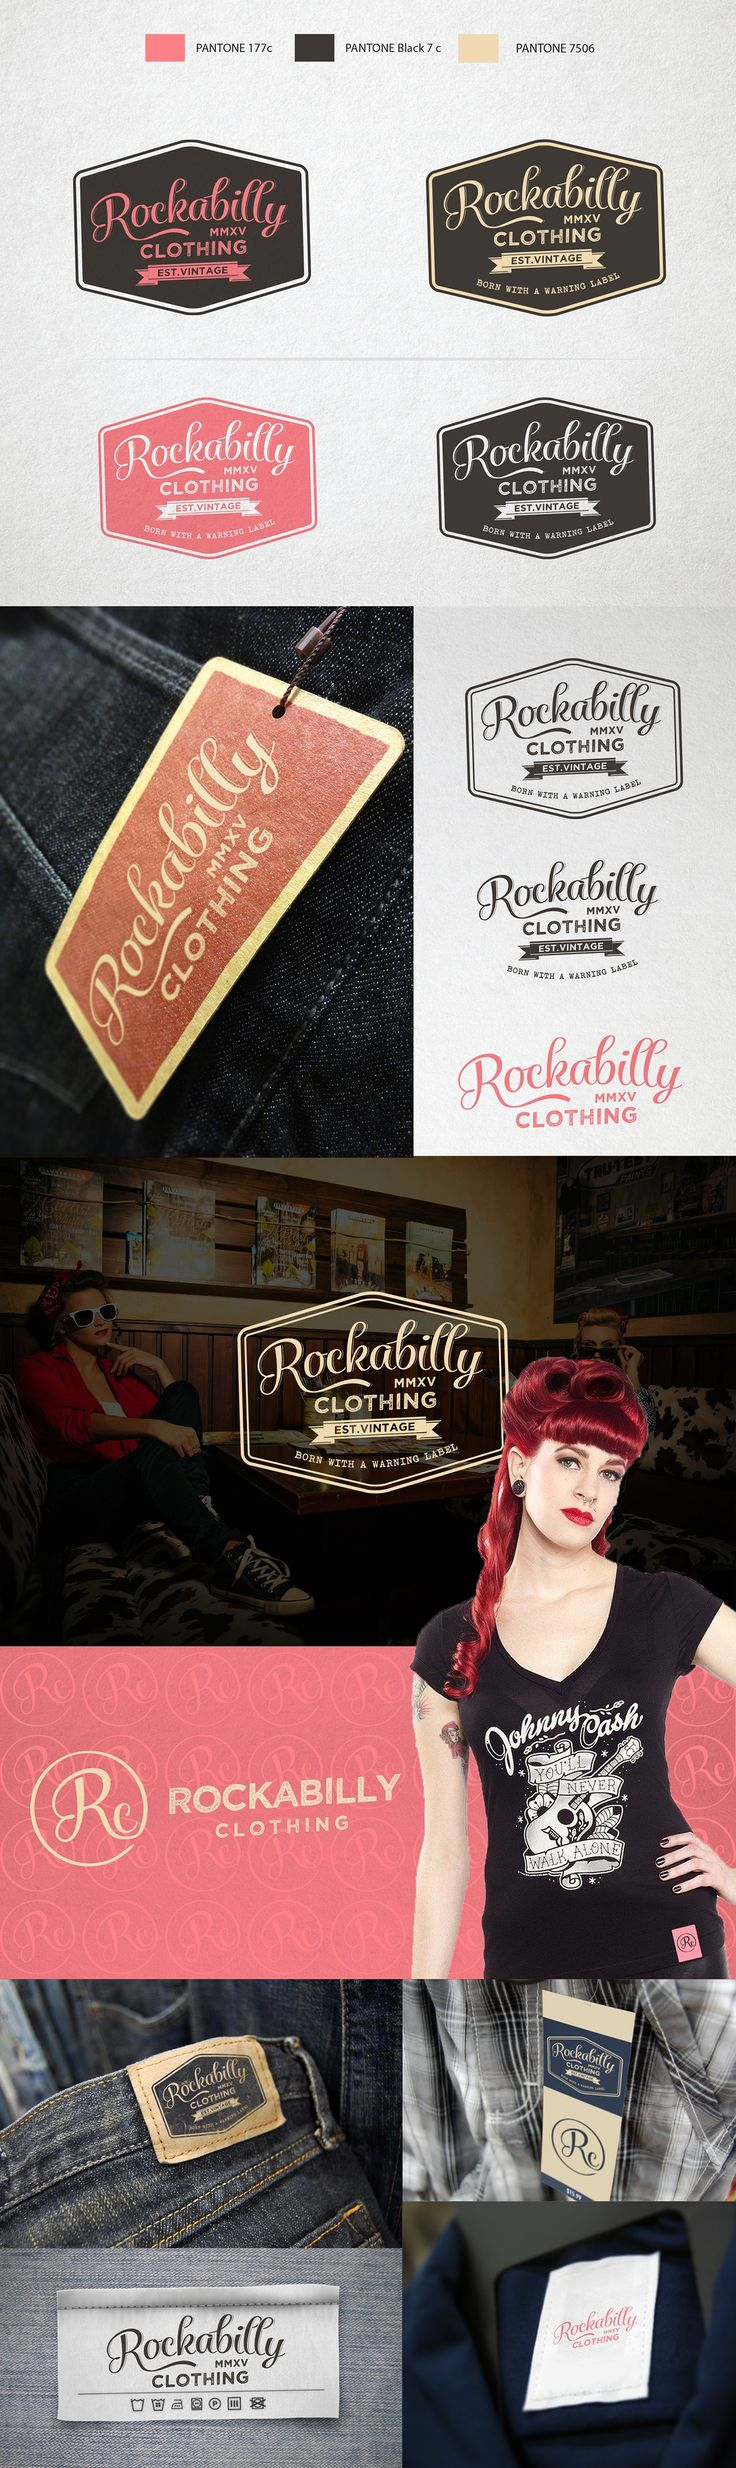 Logo for Rockabilly Clothing